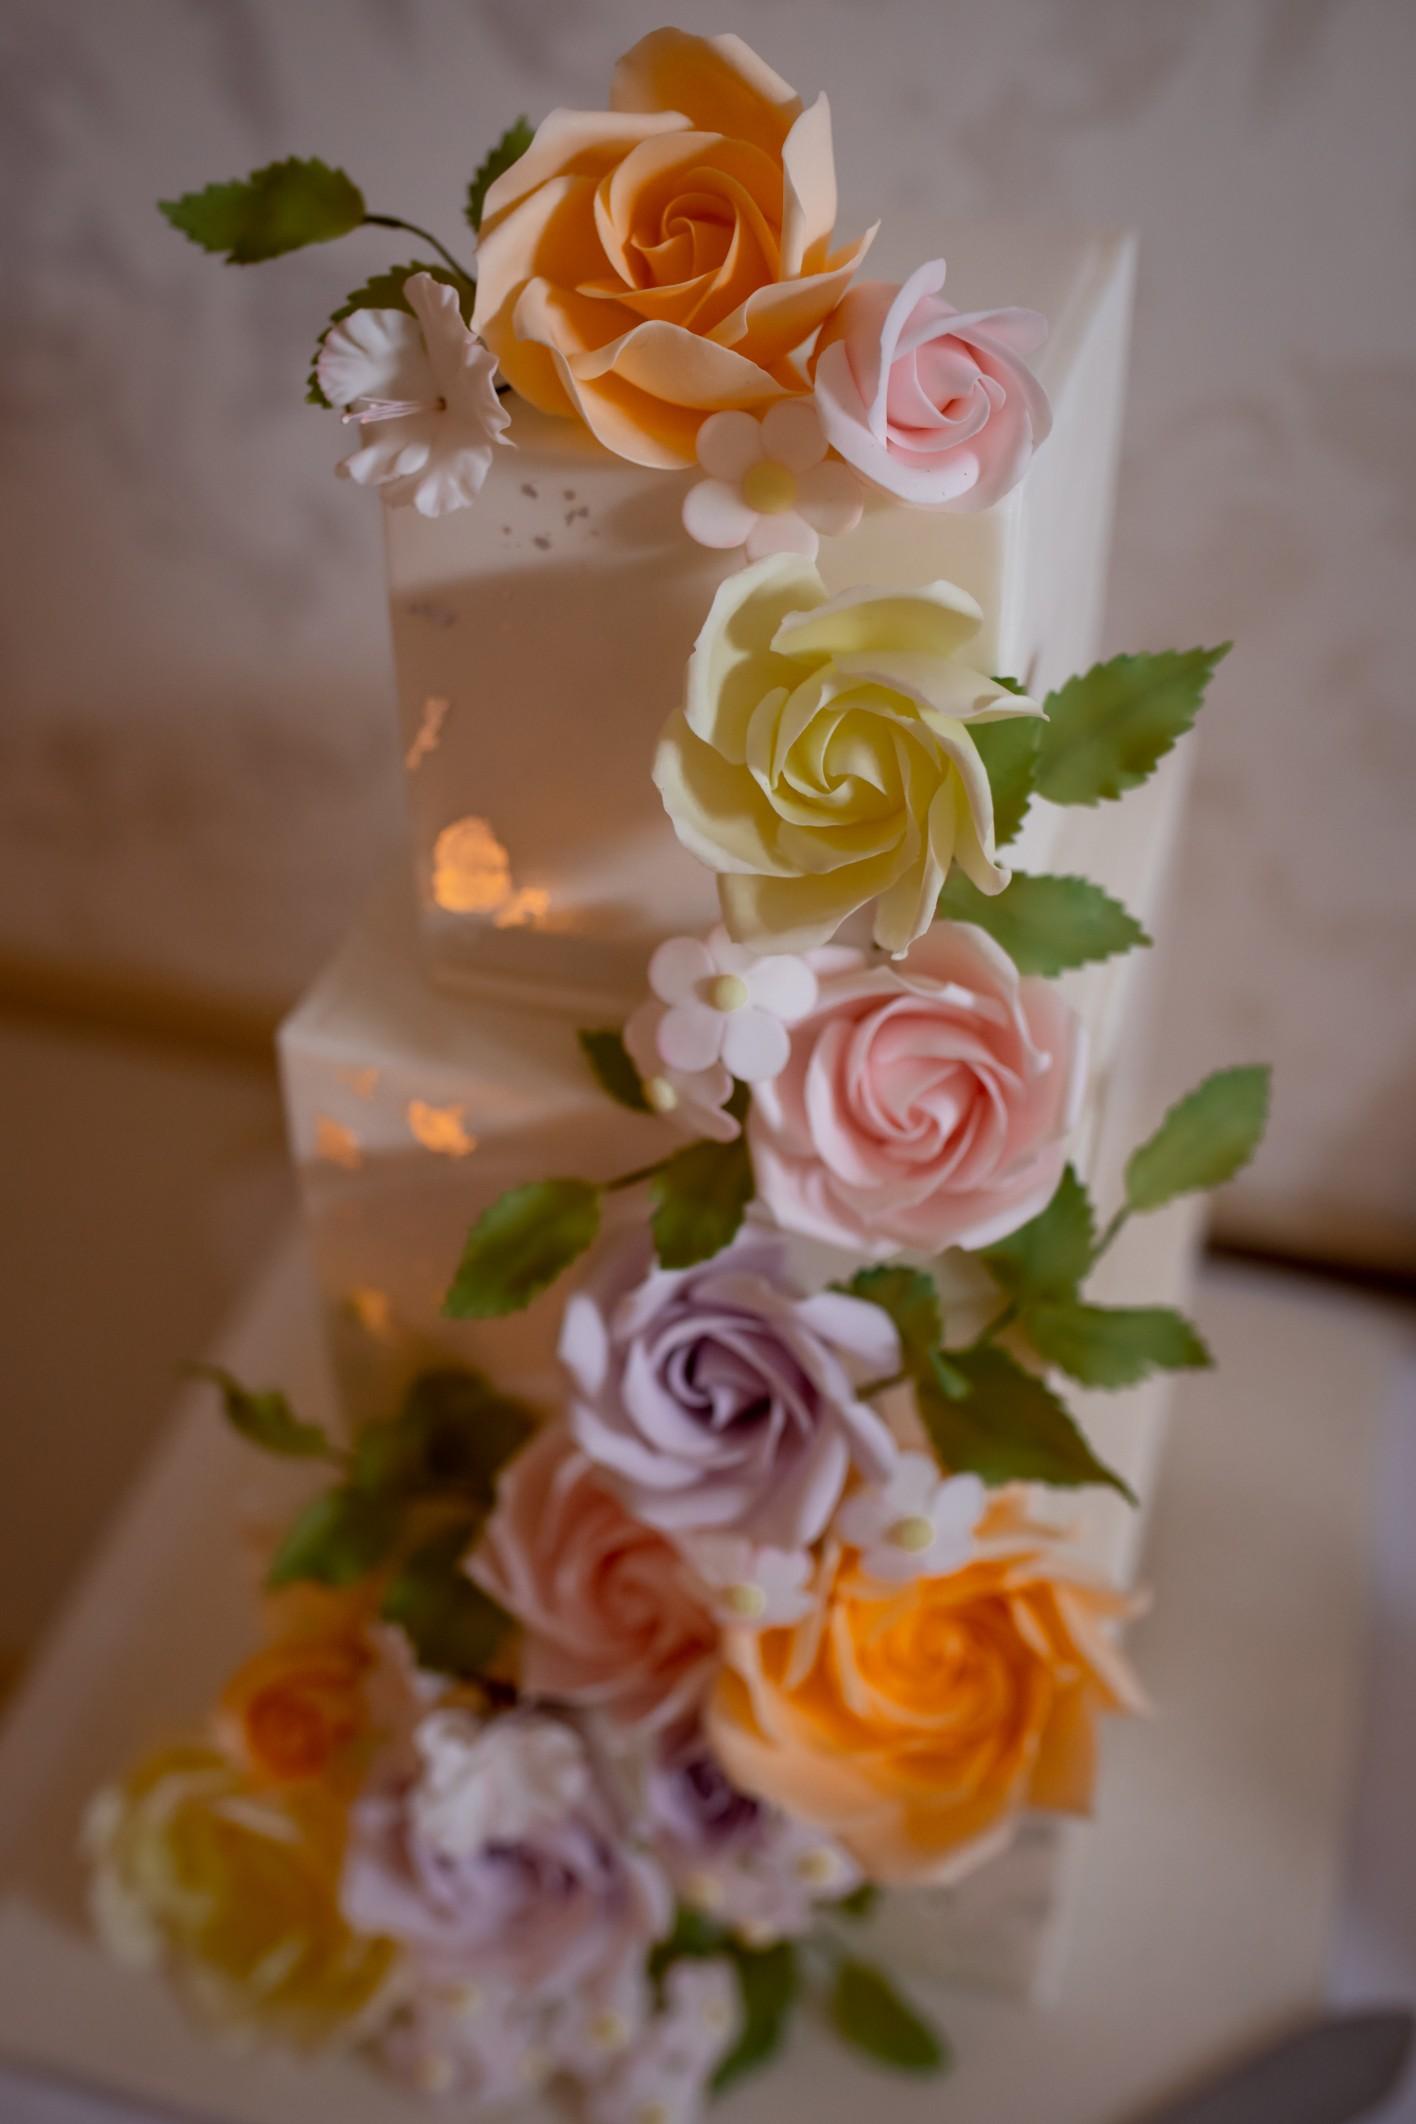 square wedding cake with pastel flowers - unique wedding cake - pastel wedding cake